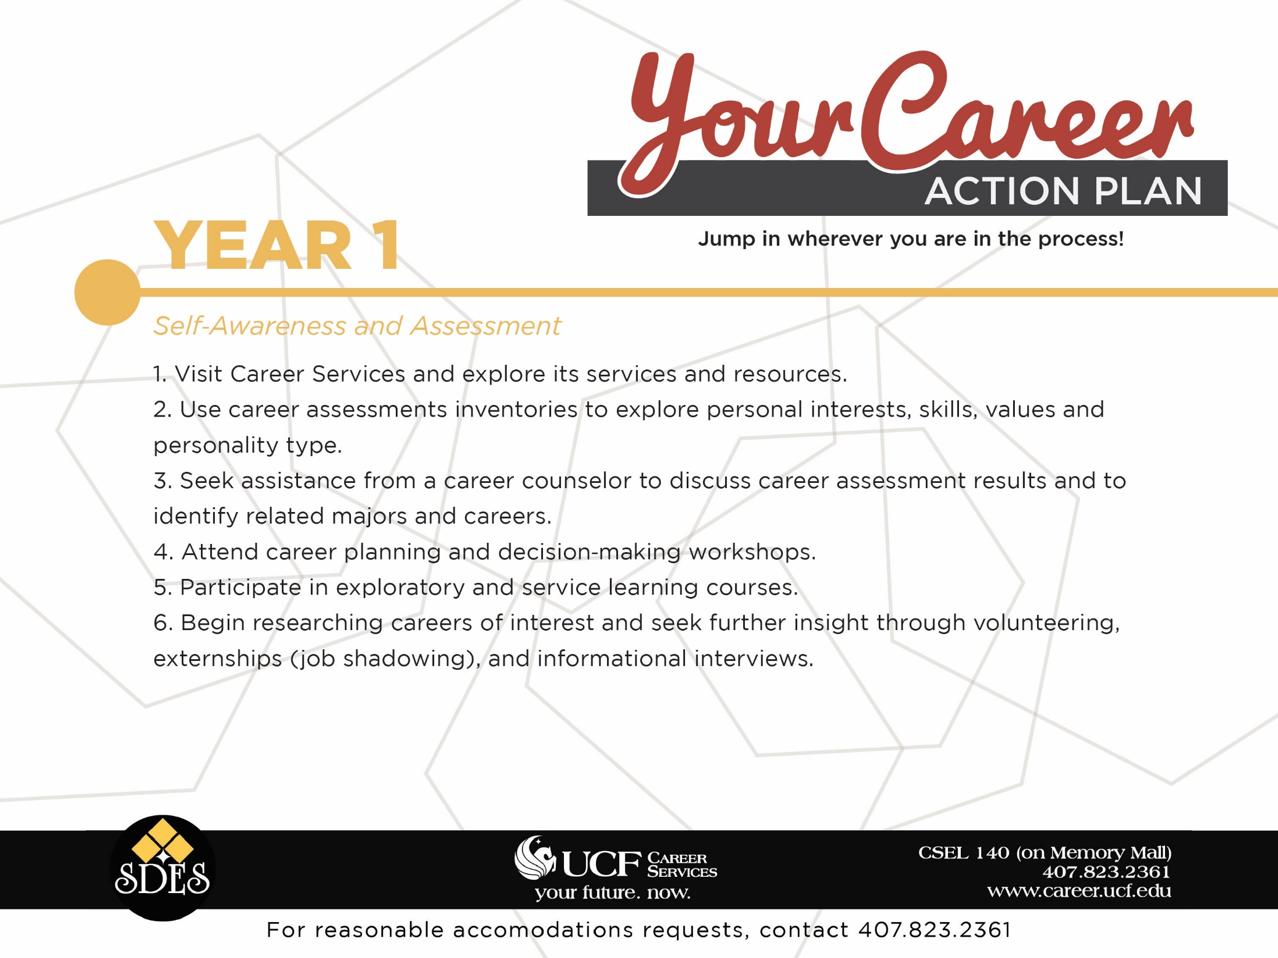 career services career graduate school resources ucf career plan year 1